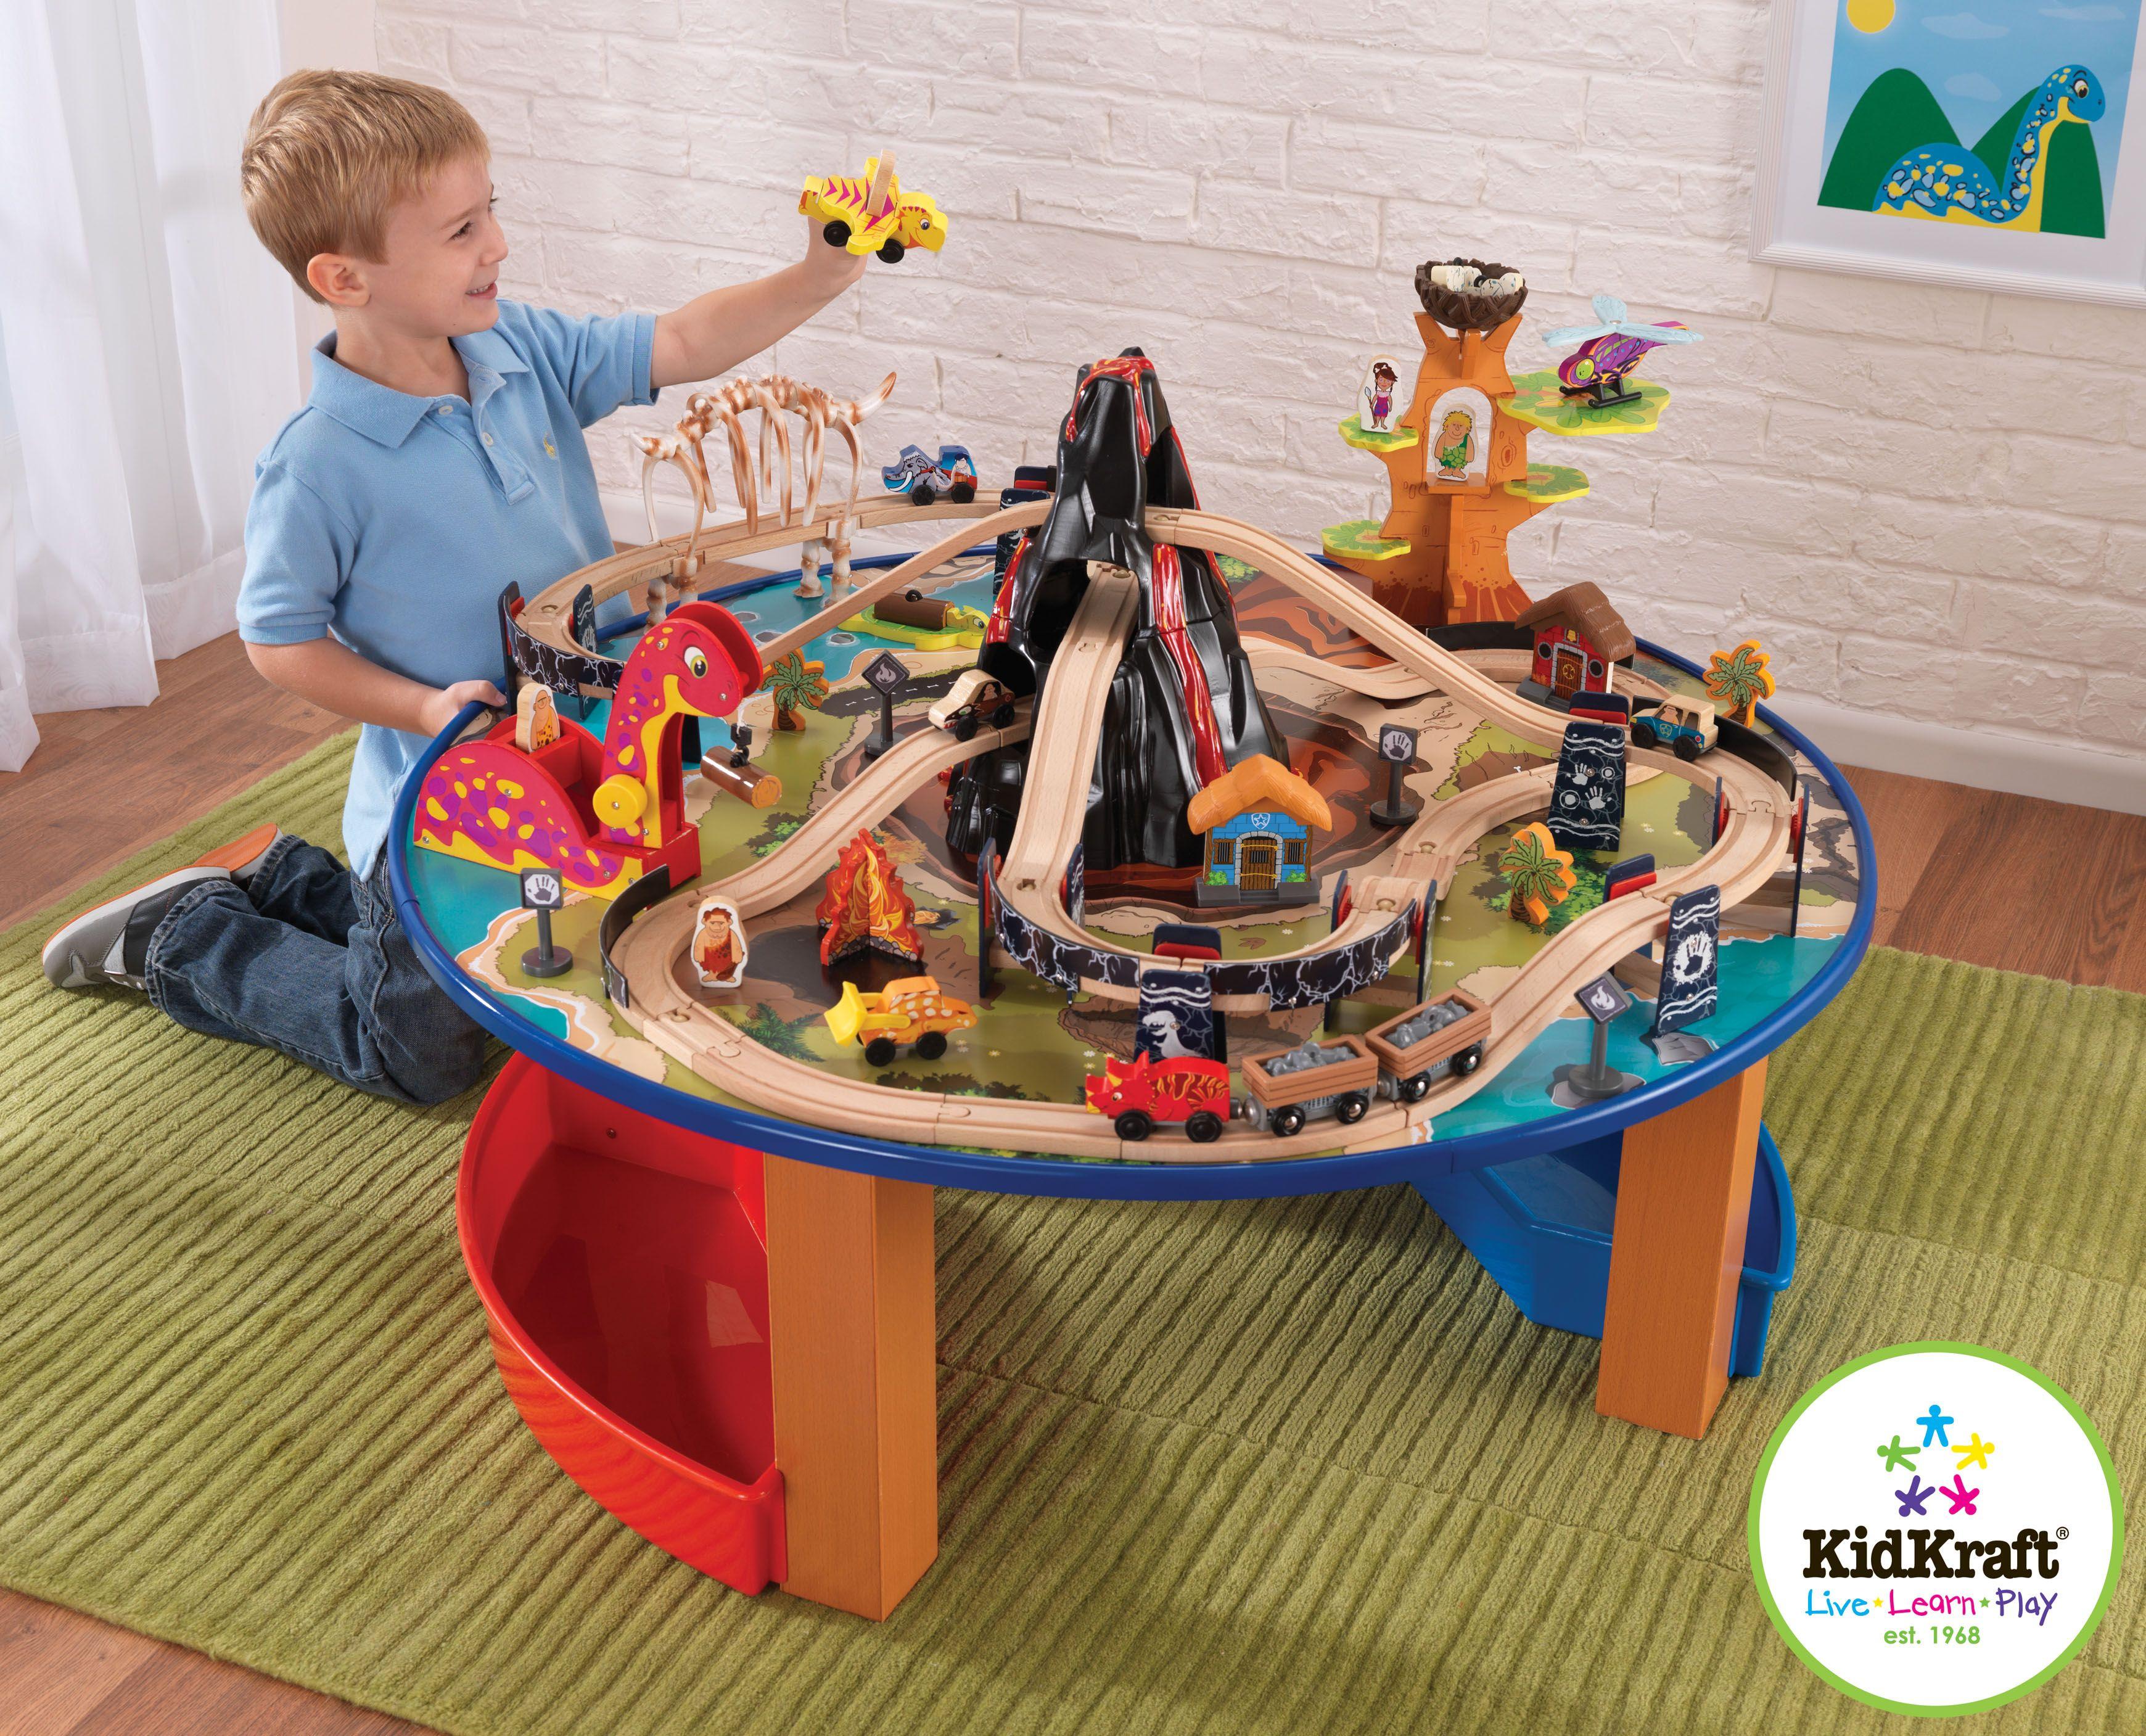 Toy Train - Kid Kraft Dino Train Set and Table From Vistastores & Toy Train - Kid Kraft Dino Train Set and Table From Vistastores ...